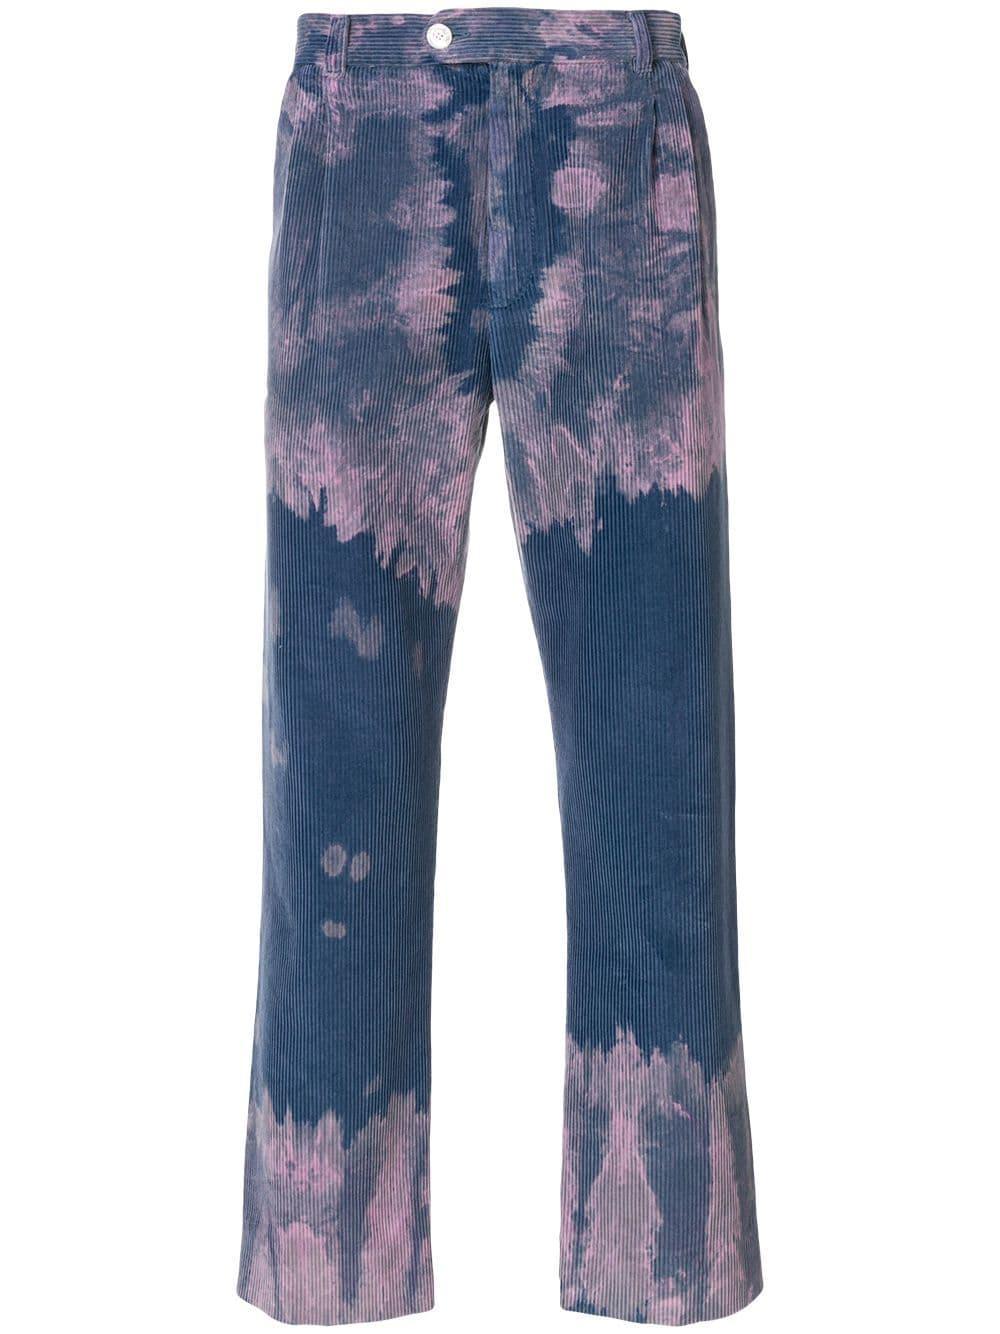 Pantalones De Pana Desmanchados Gucci De Hombre De Color Azul Lyst